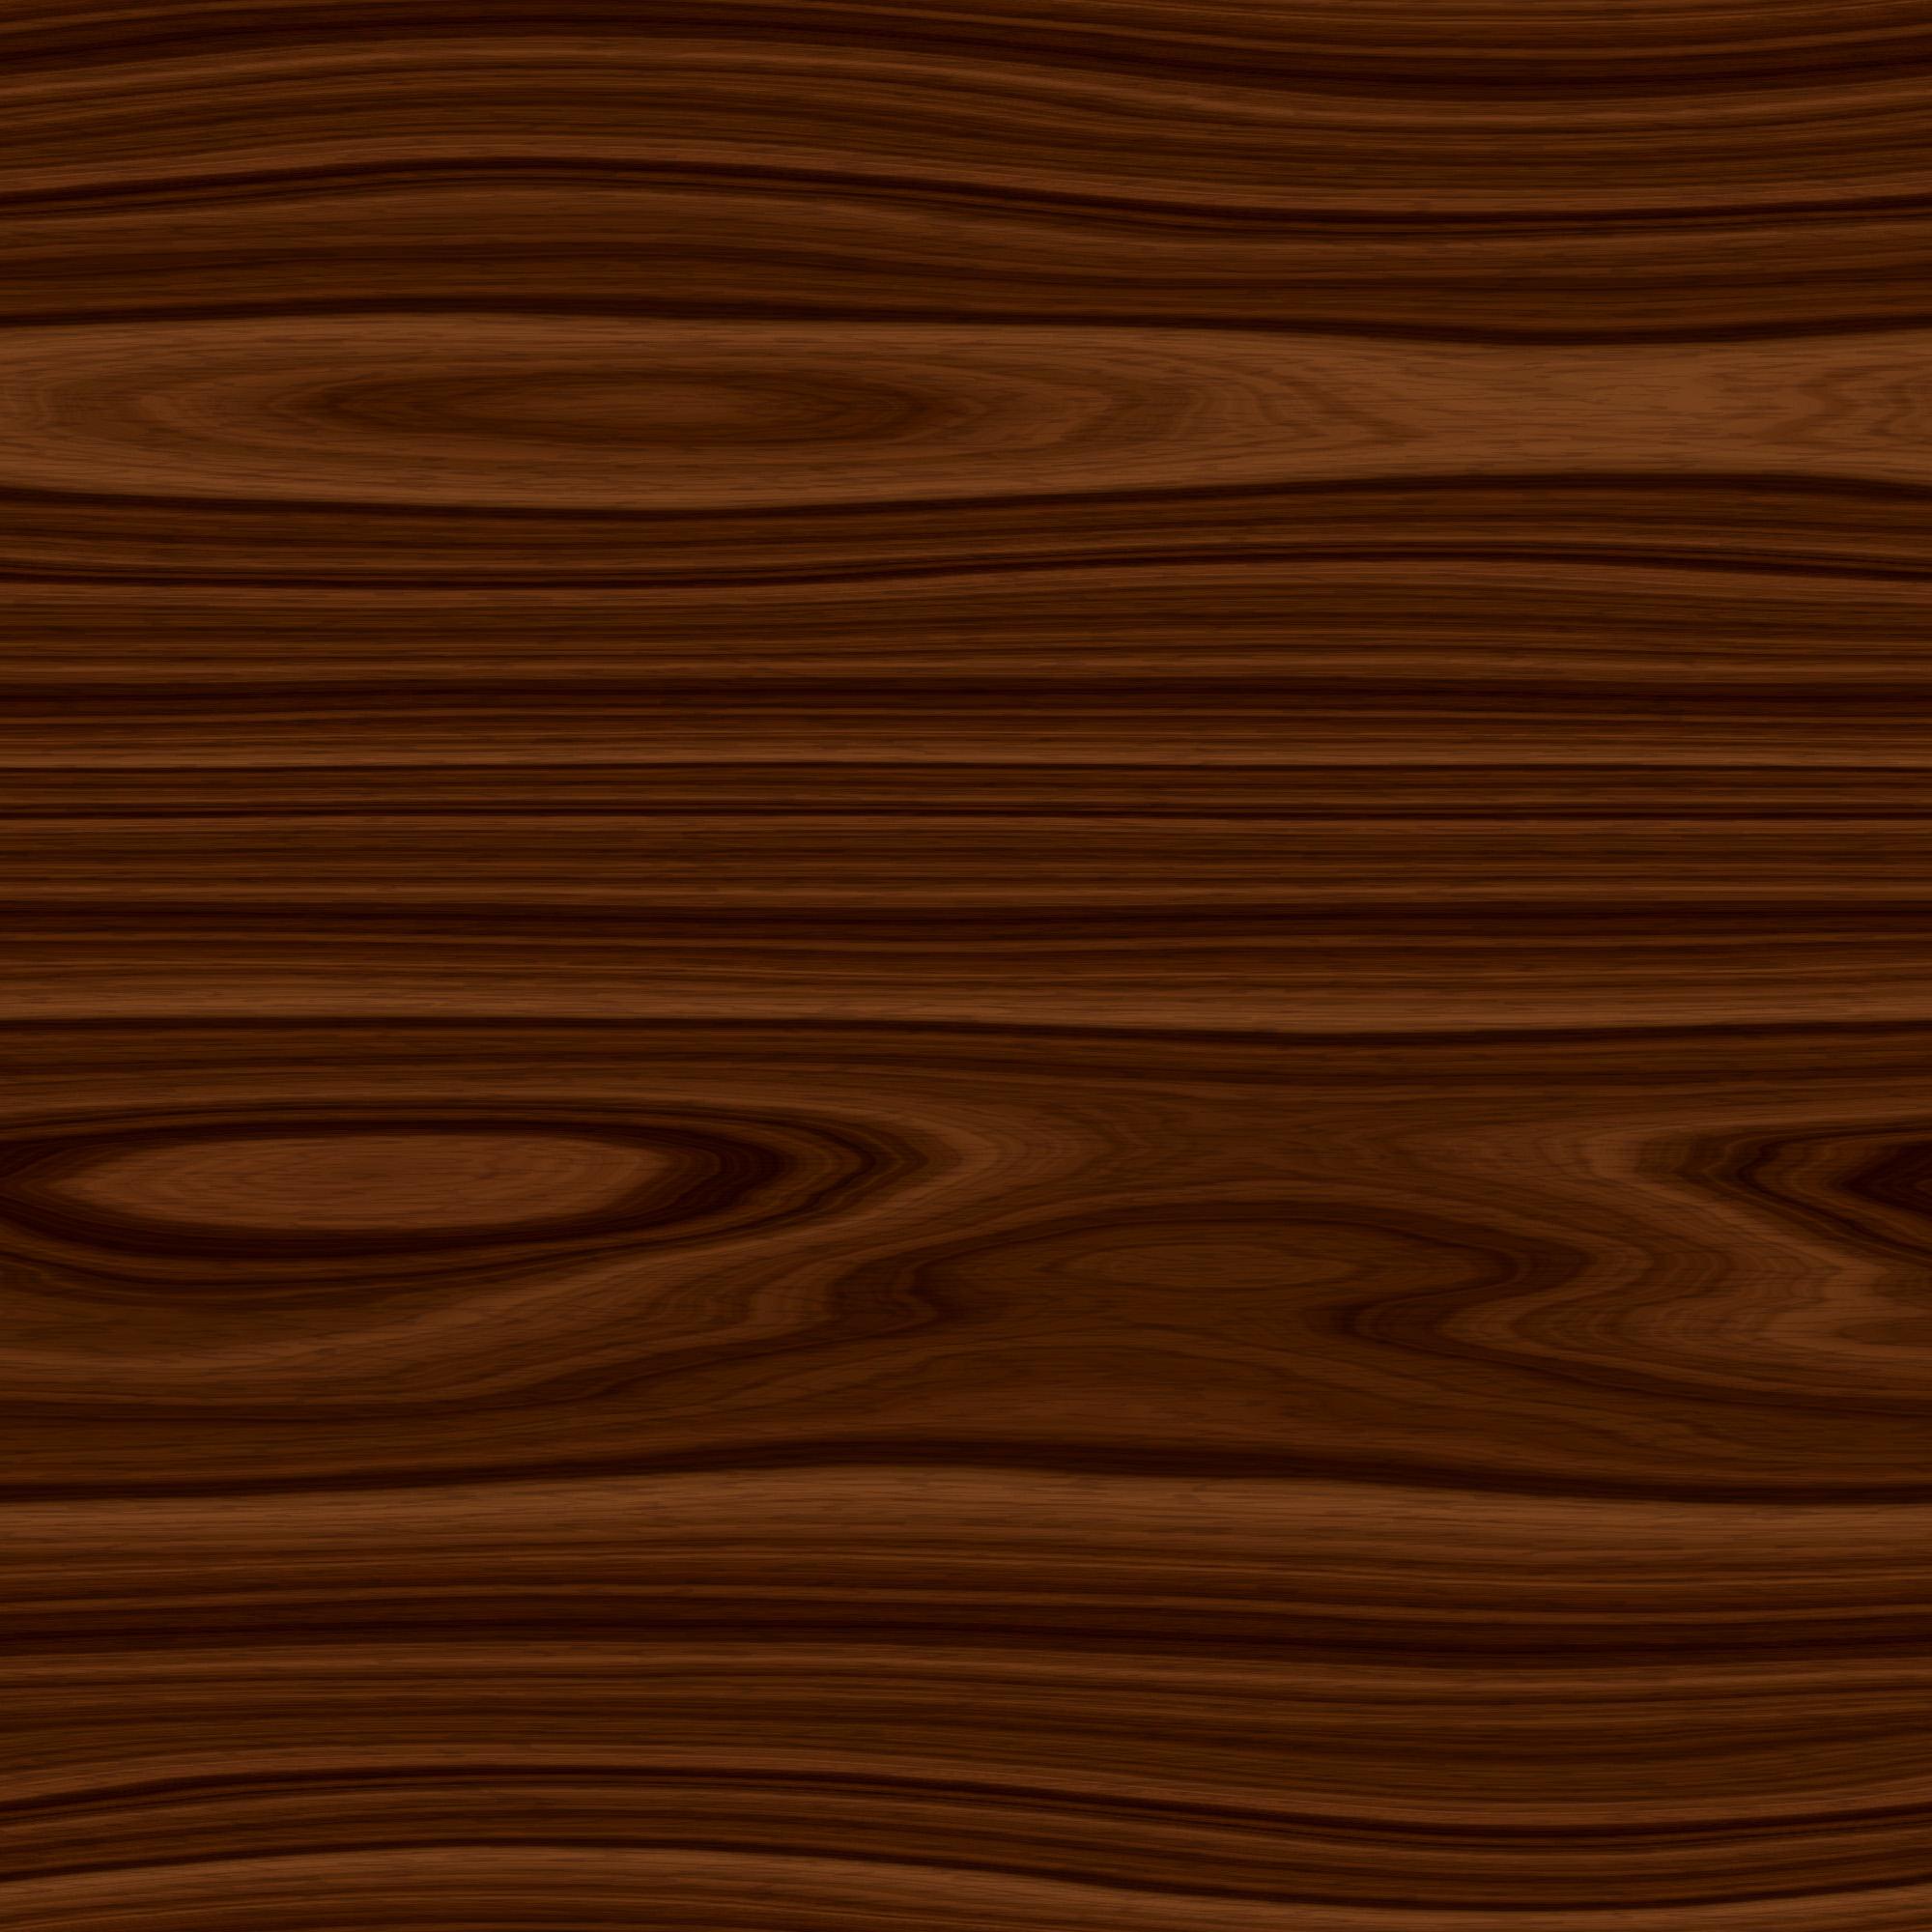 20+ Dark Wood Backgrounds | HQ Backgrounds | FreeCreatives